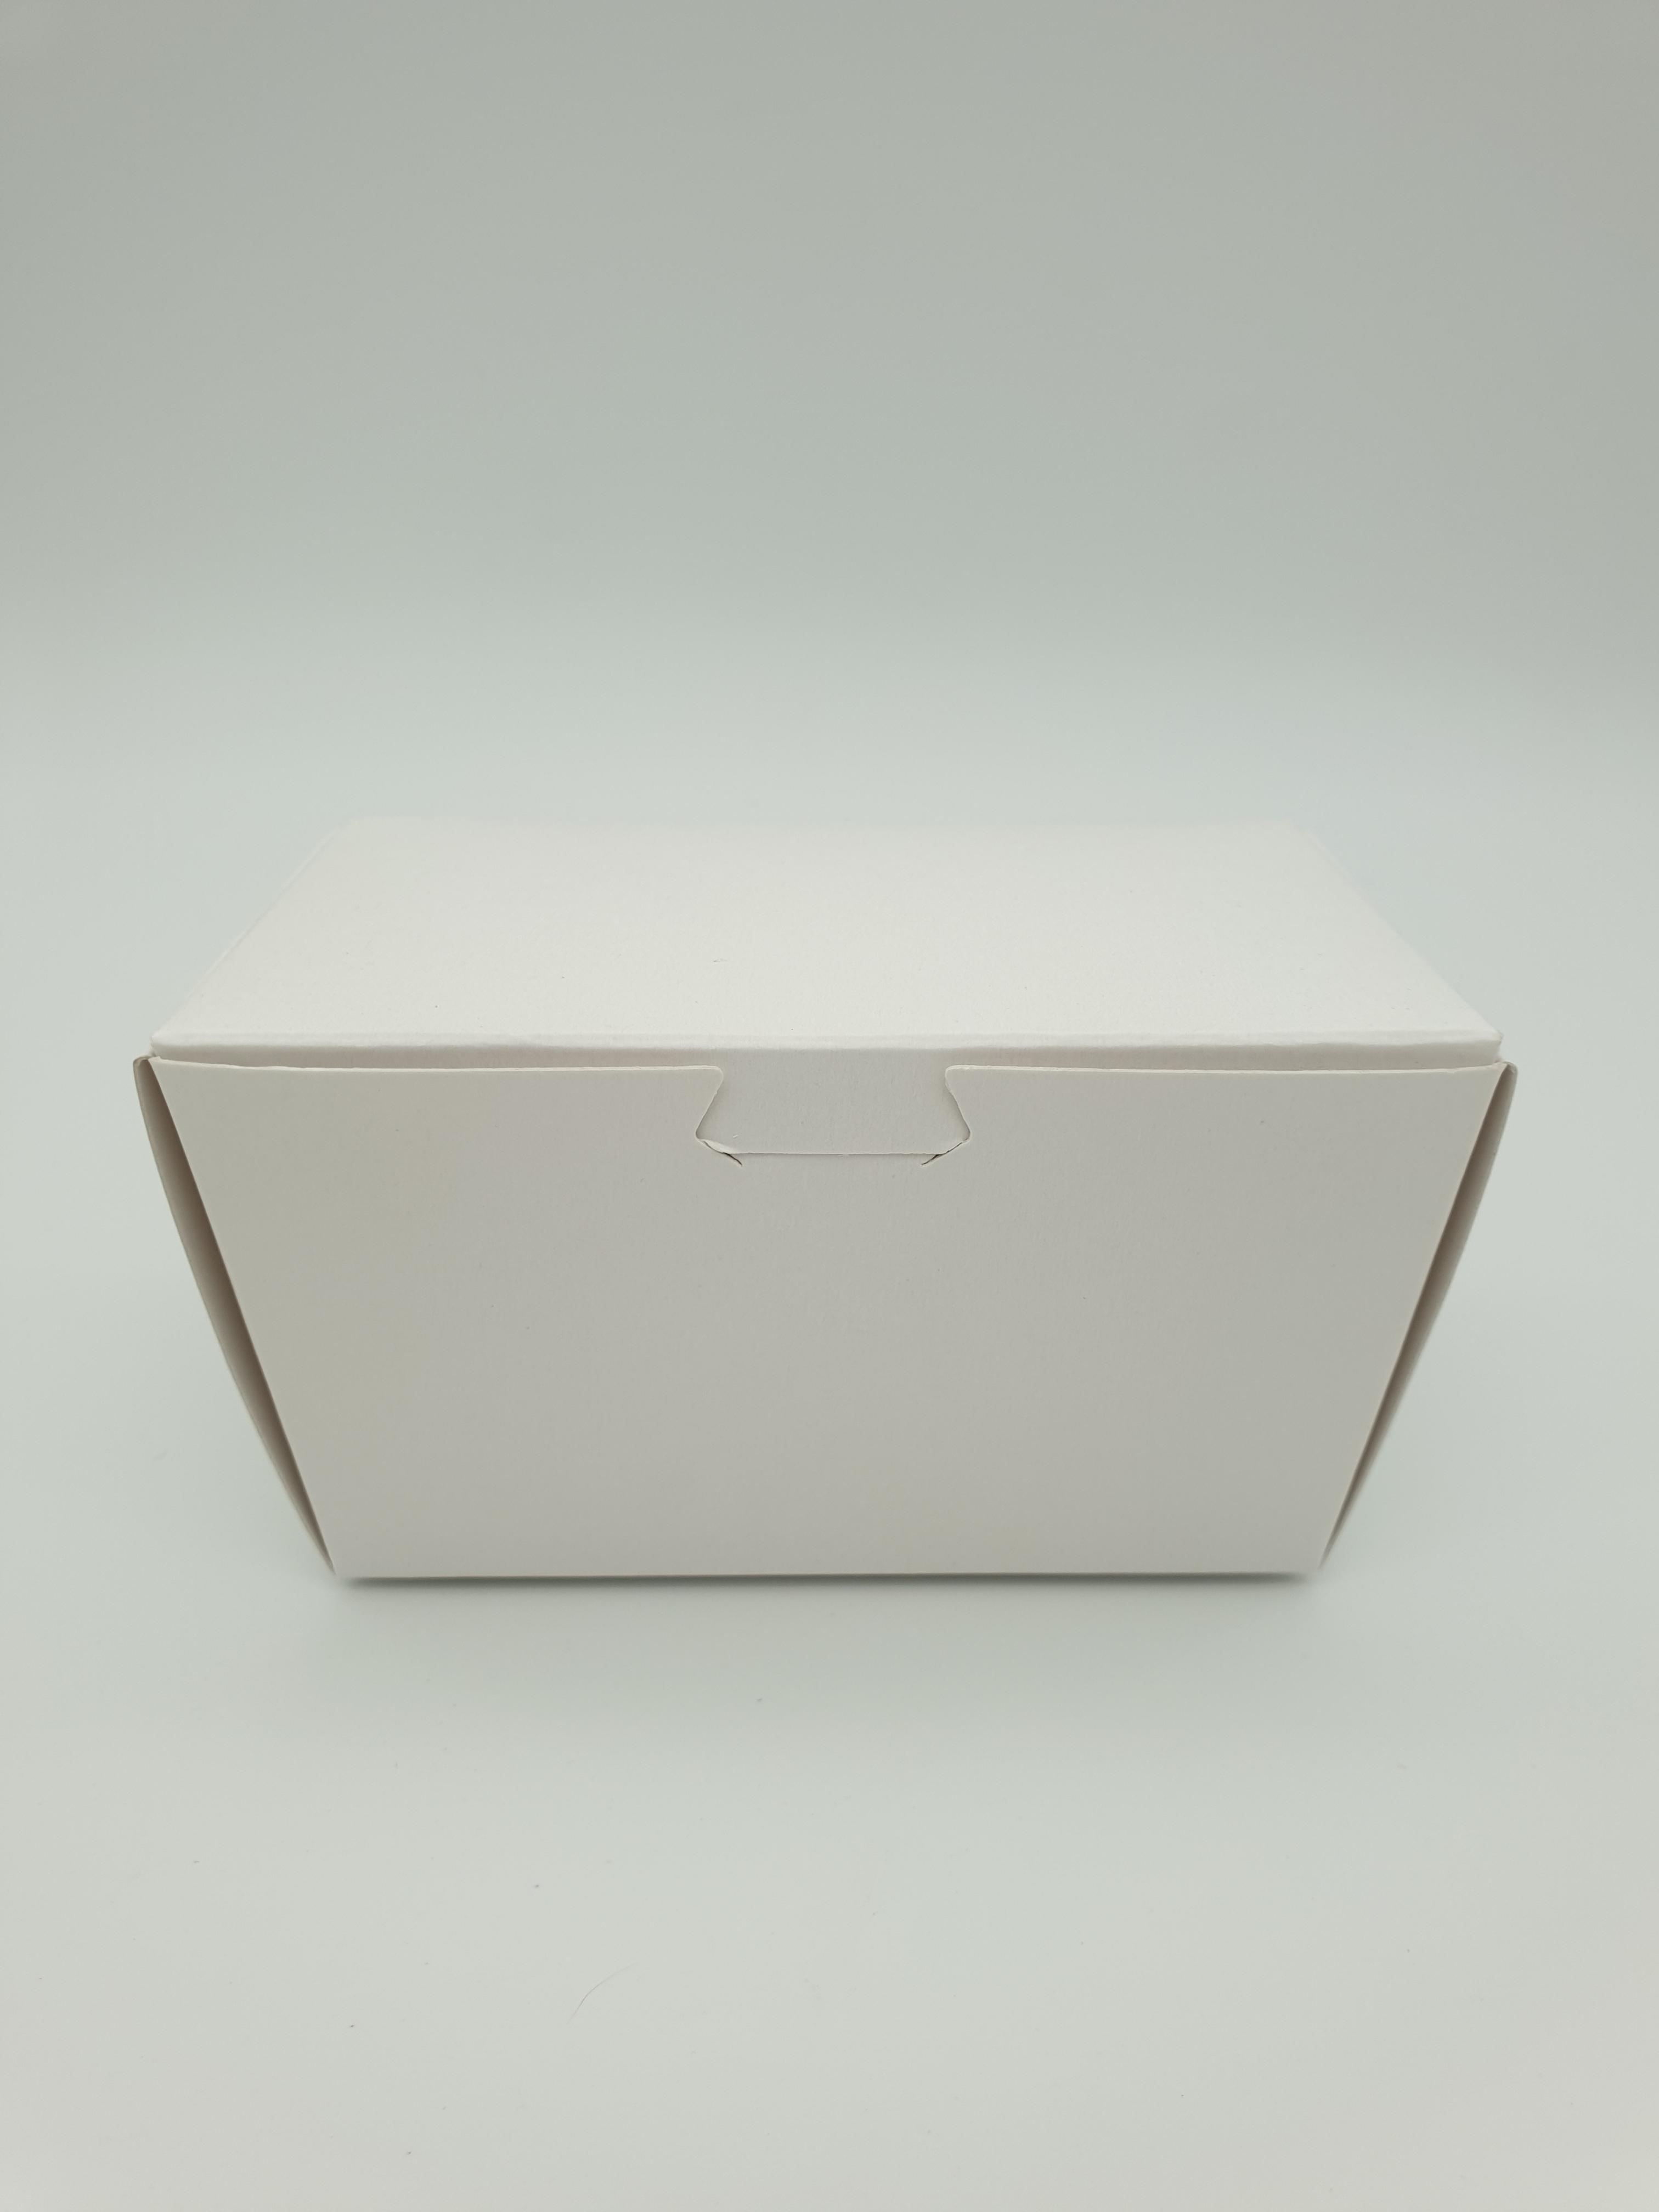 Box Truffle Large White 90Lx50Wx55Hmm (each) BTLW